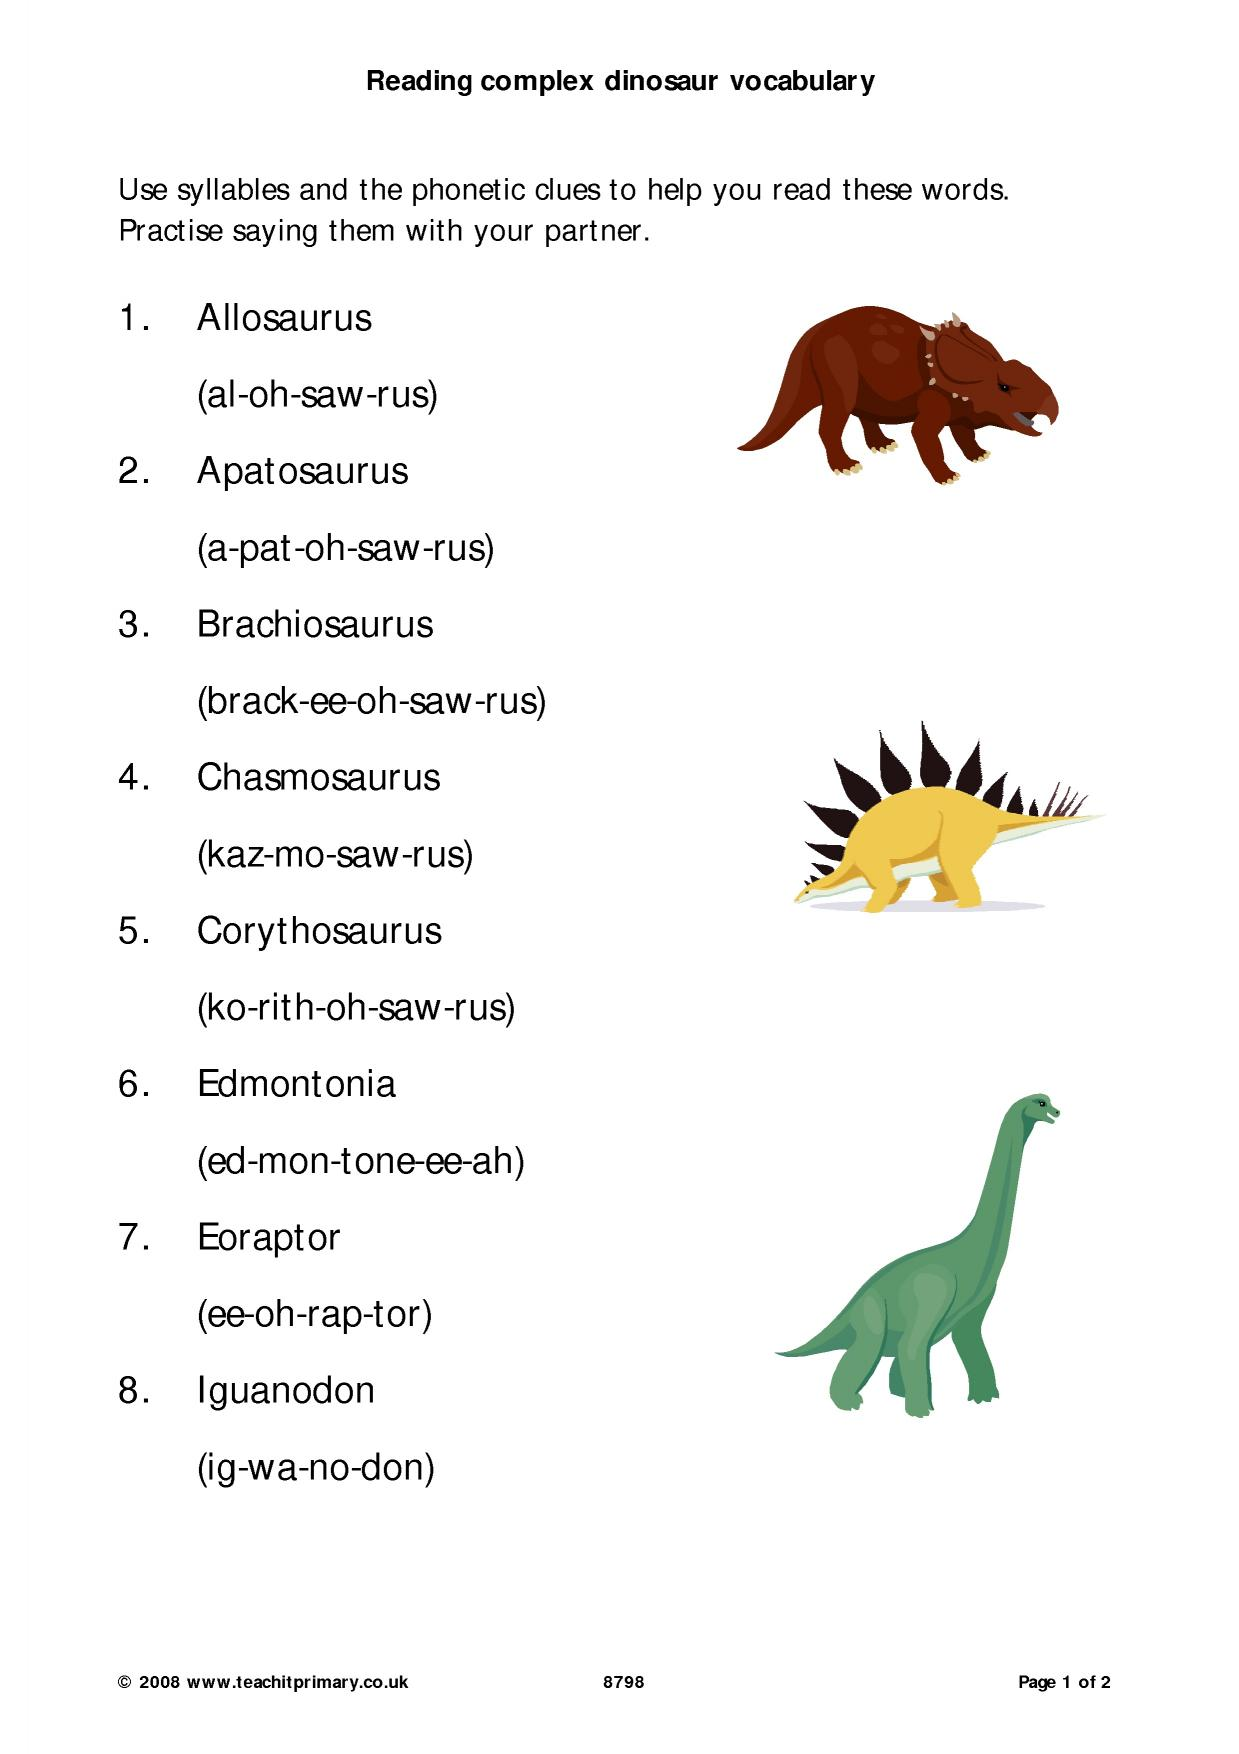 Reading Complex Dinosaur Vocabulary